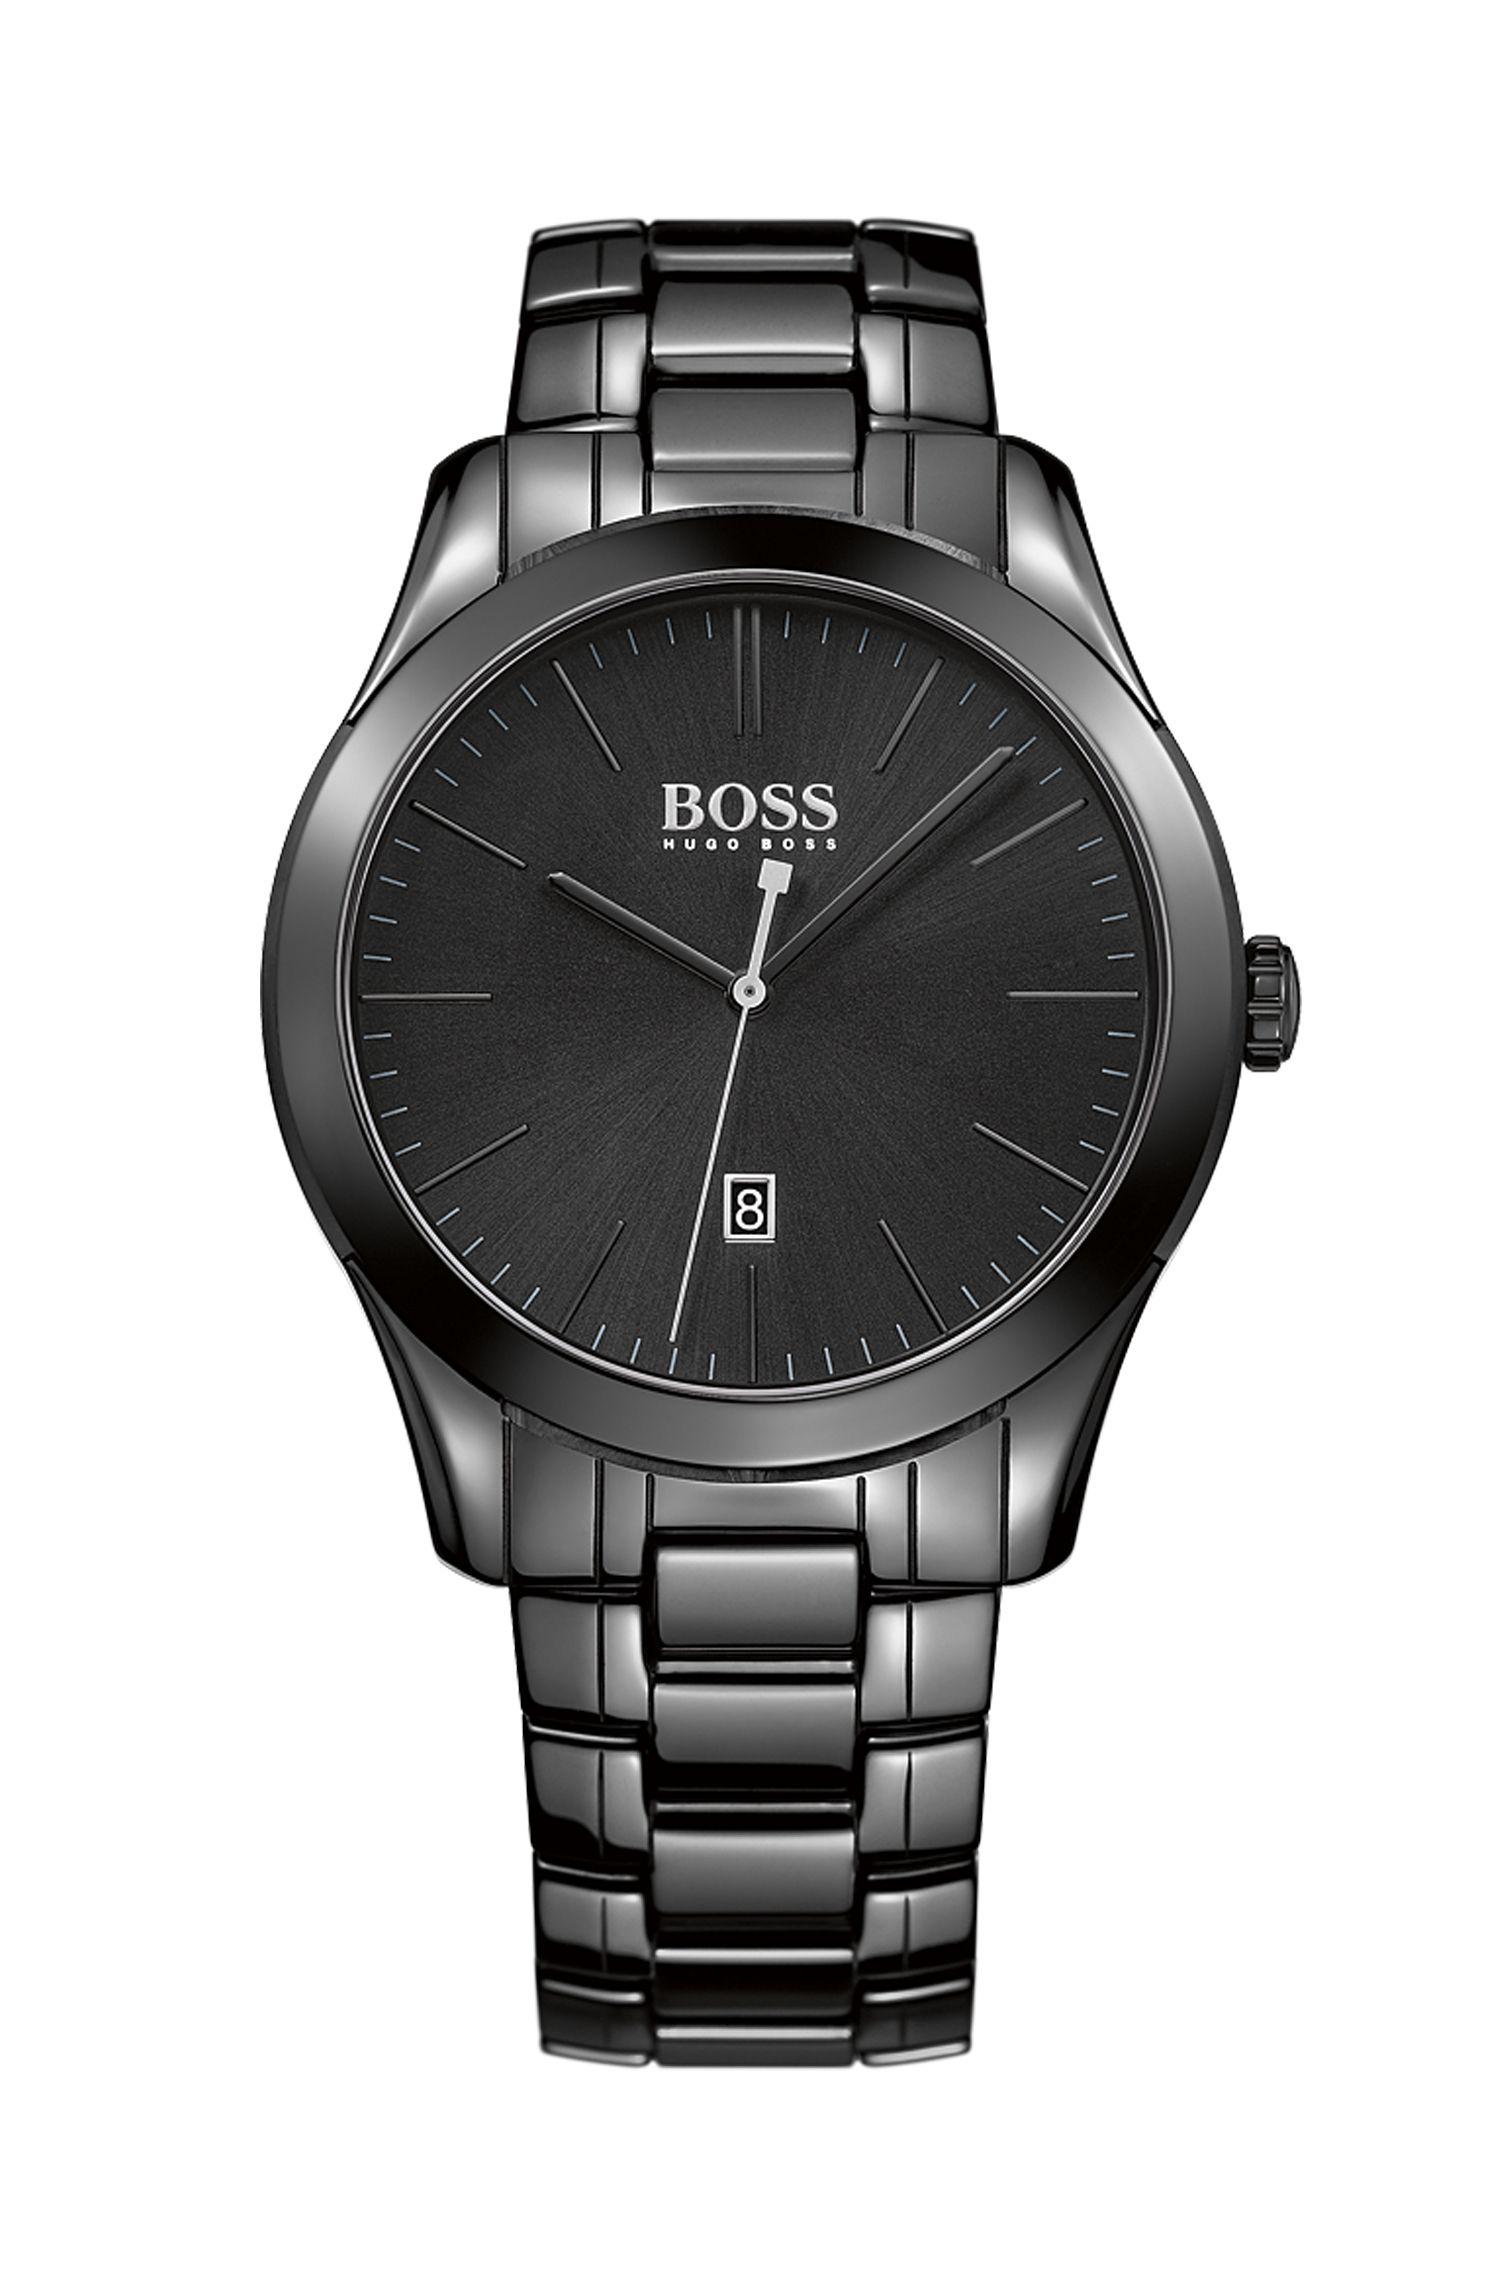 '1513223' |  Ceramic Bracelet  3-Hand Quartz Watch